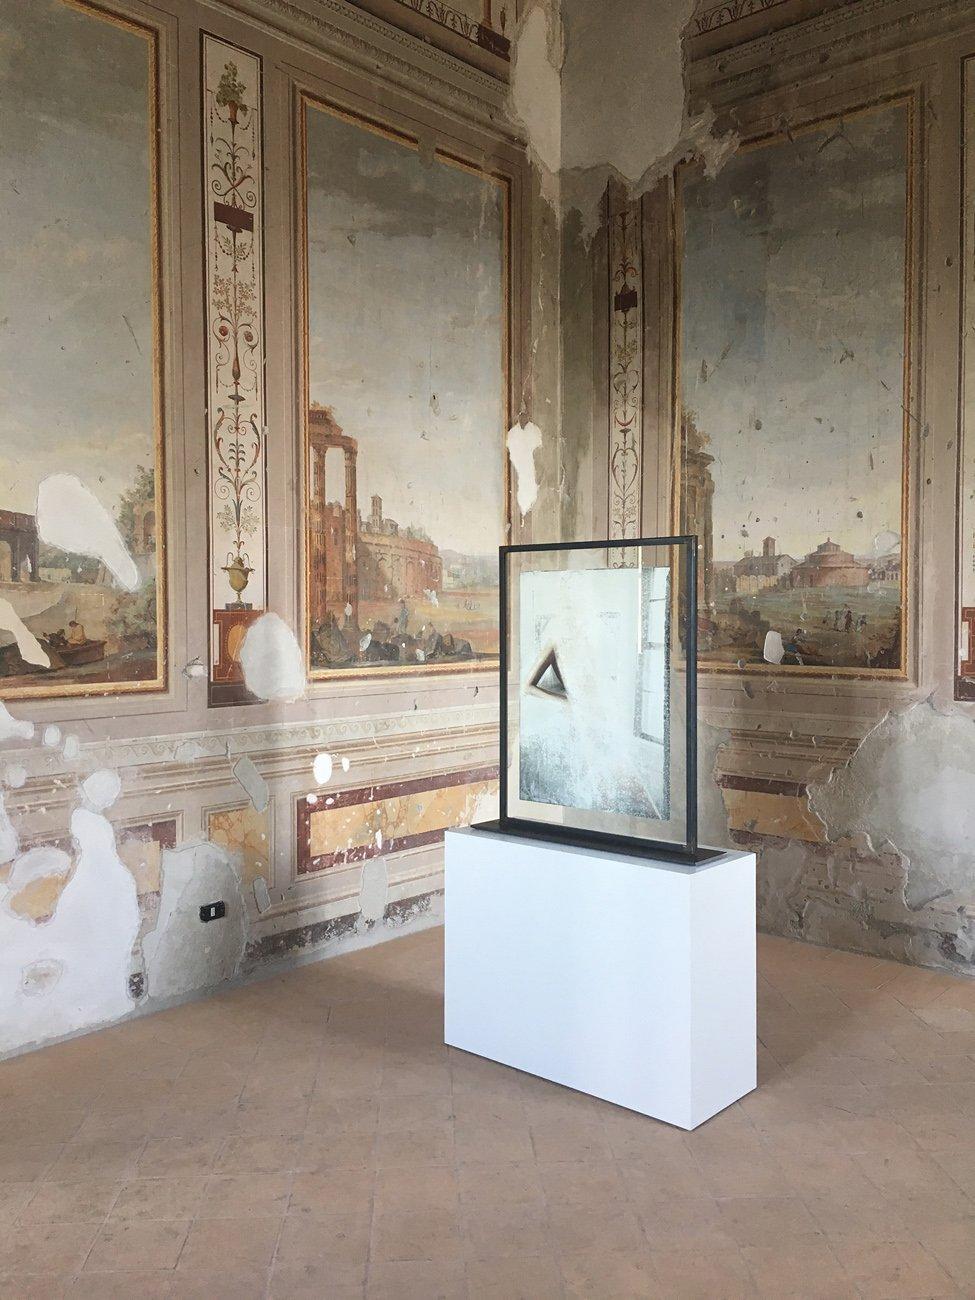 Anat Ebgi, Amie Dicke at Granpalazzo, Installation view, 2017